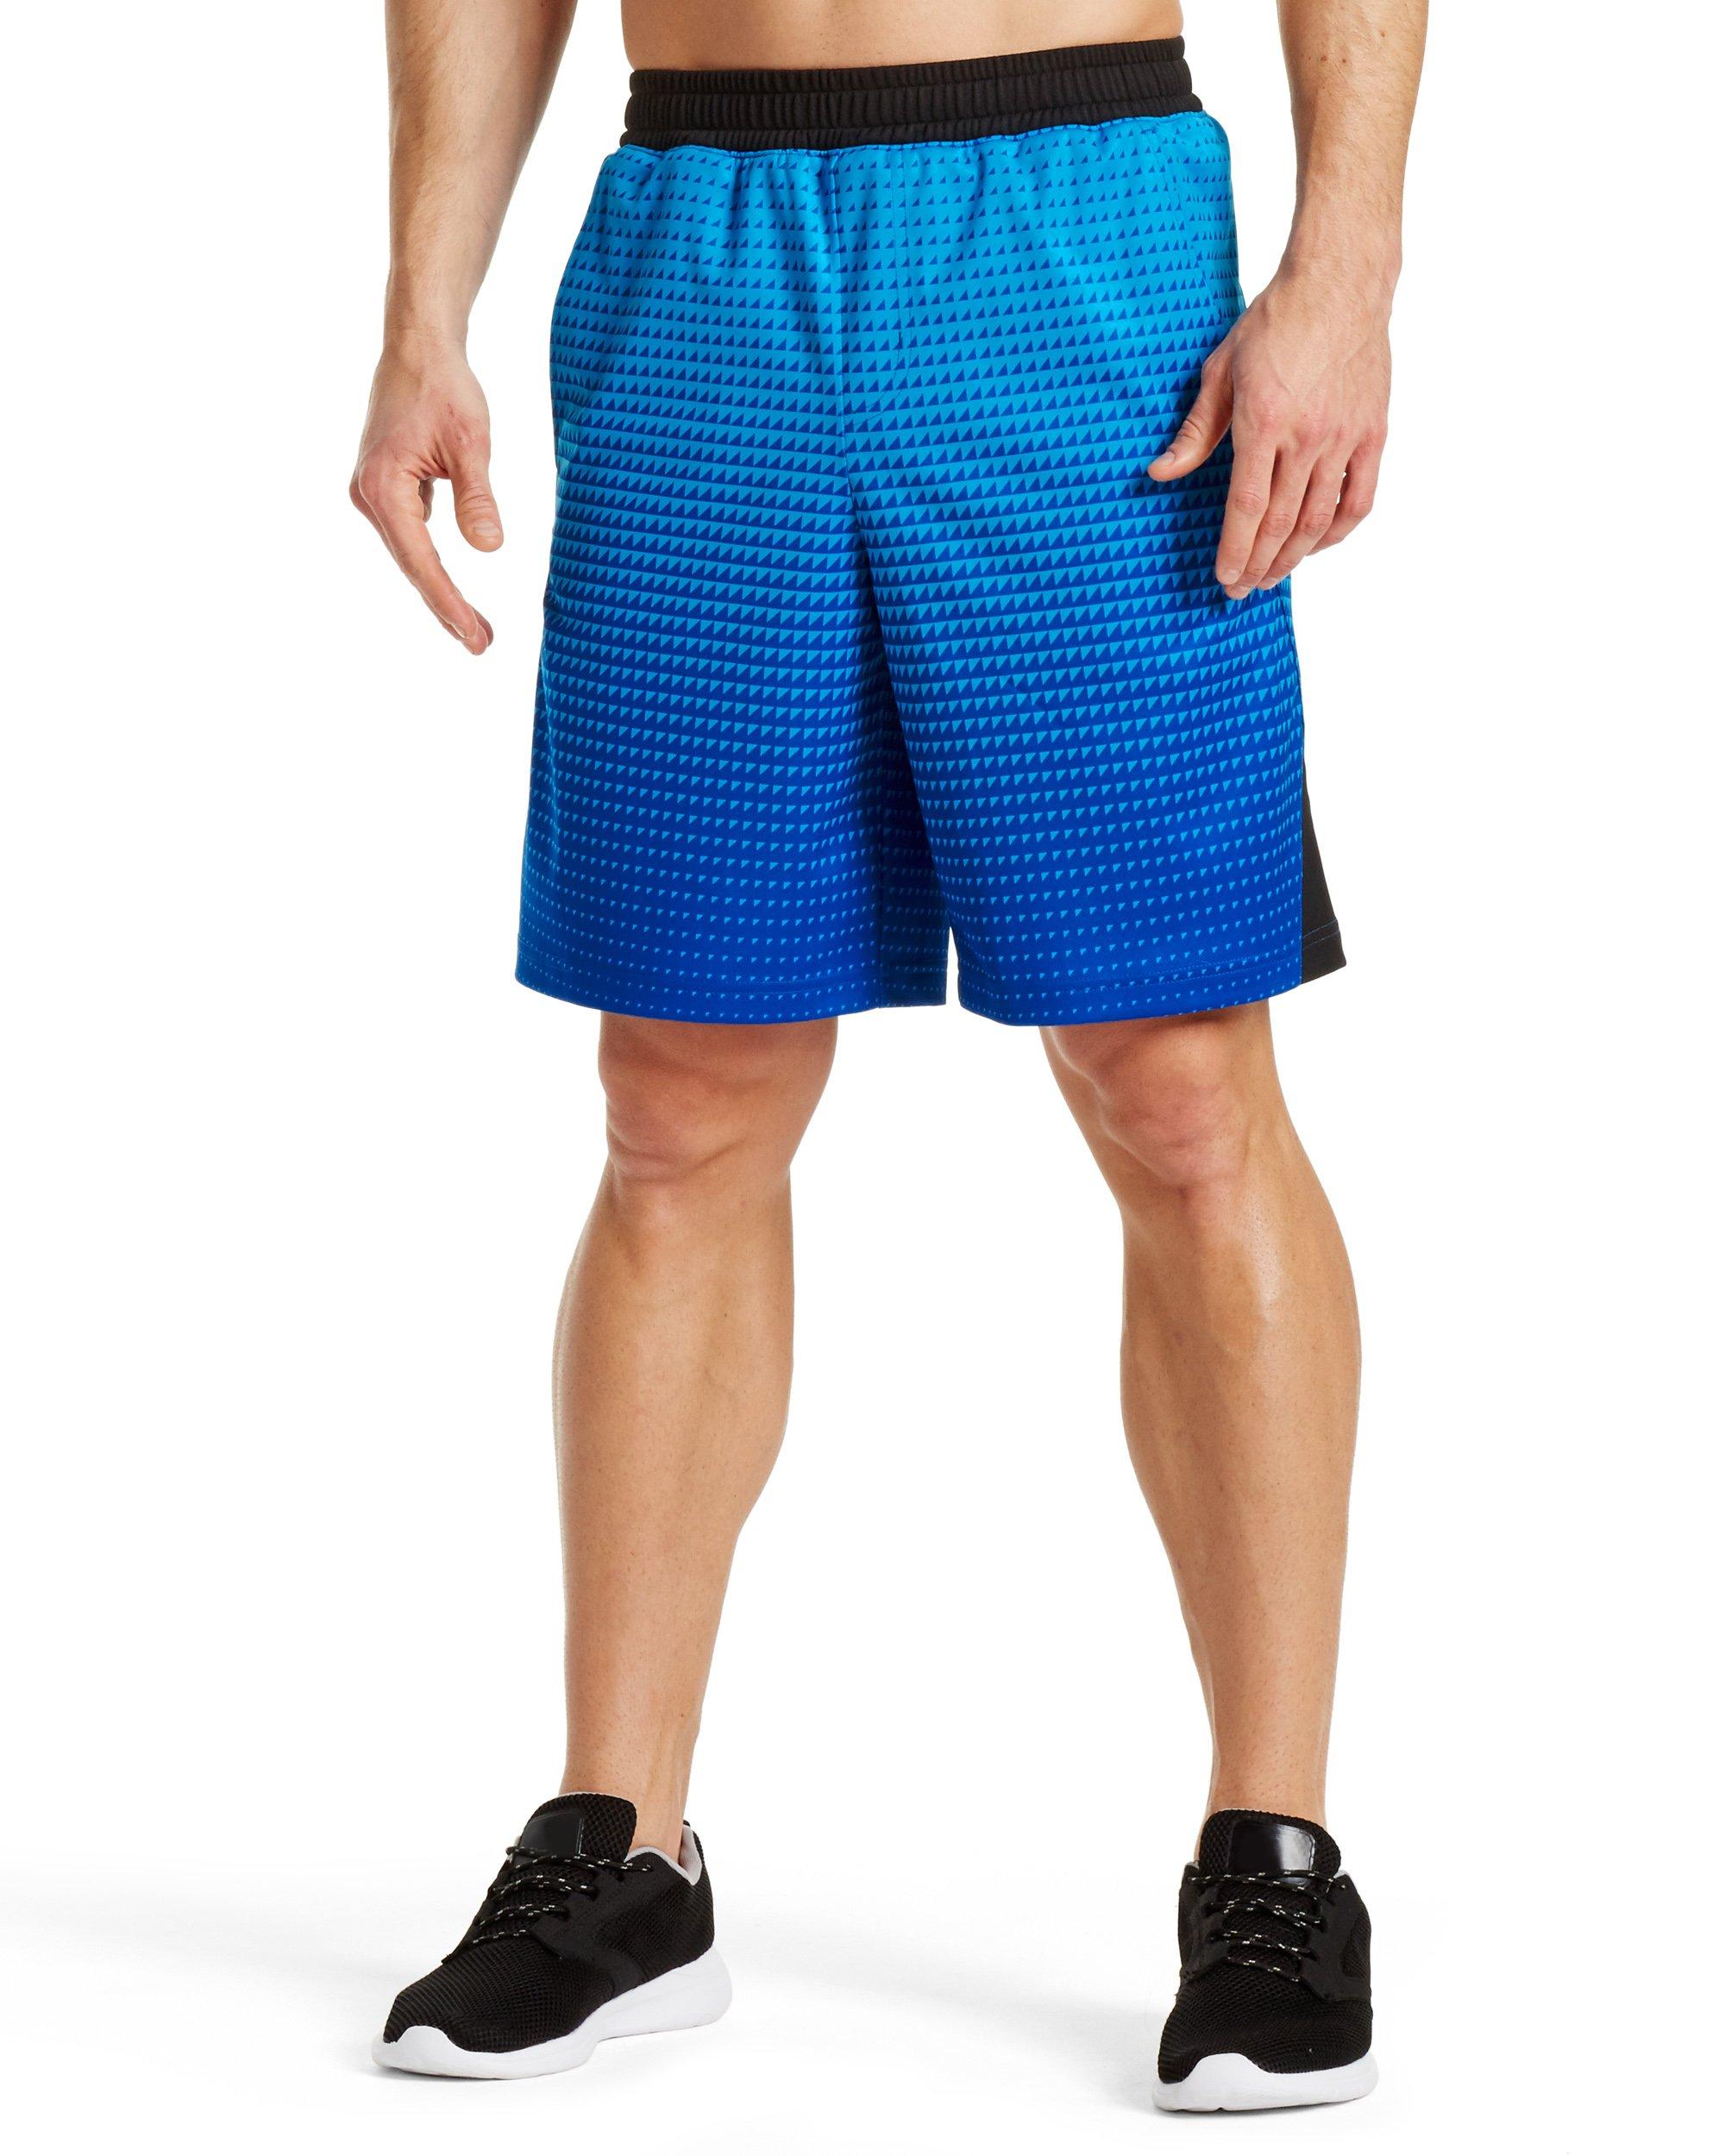 "Mission Men's VaporActive Element 9"" Basketball"